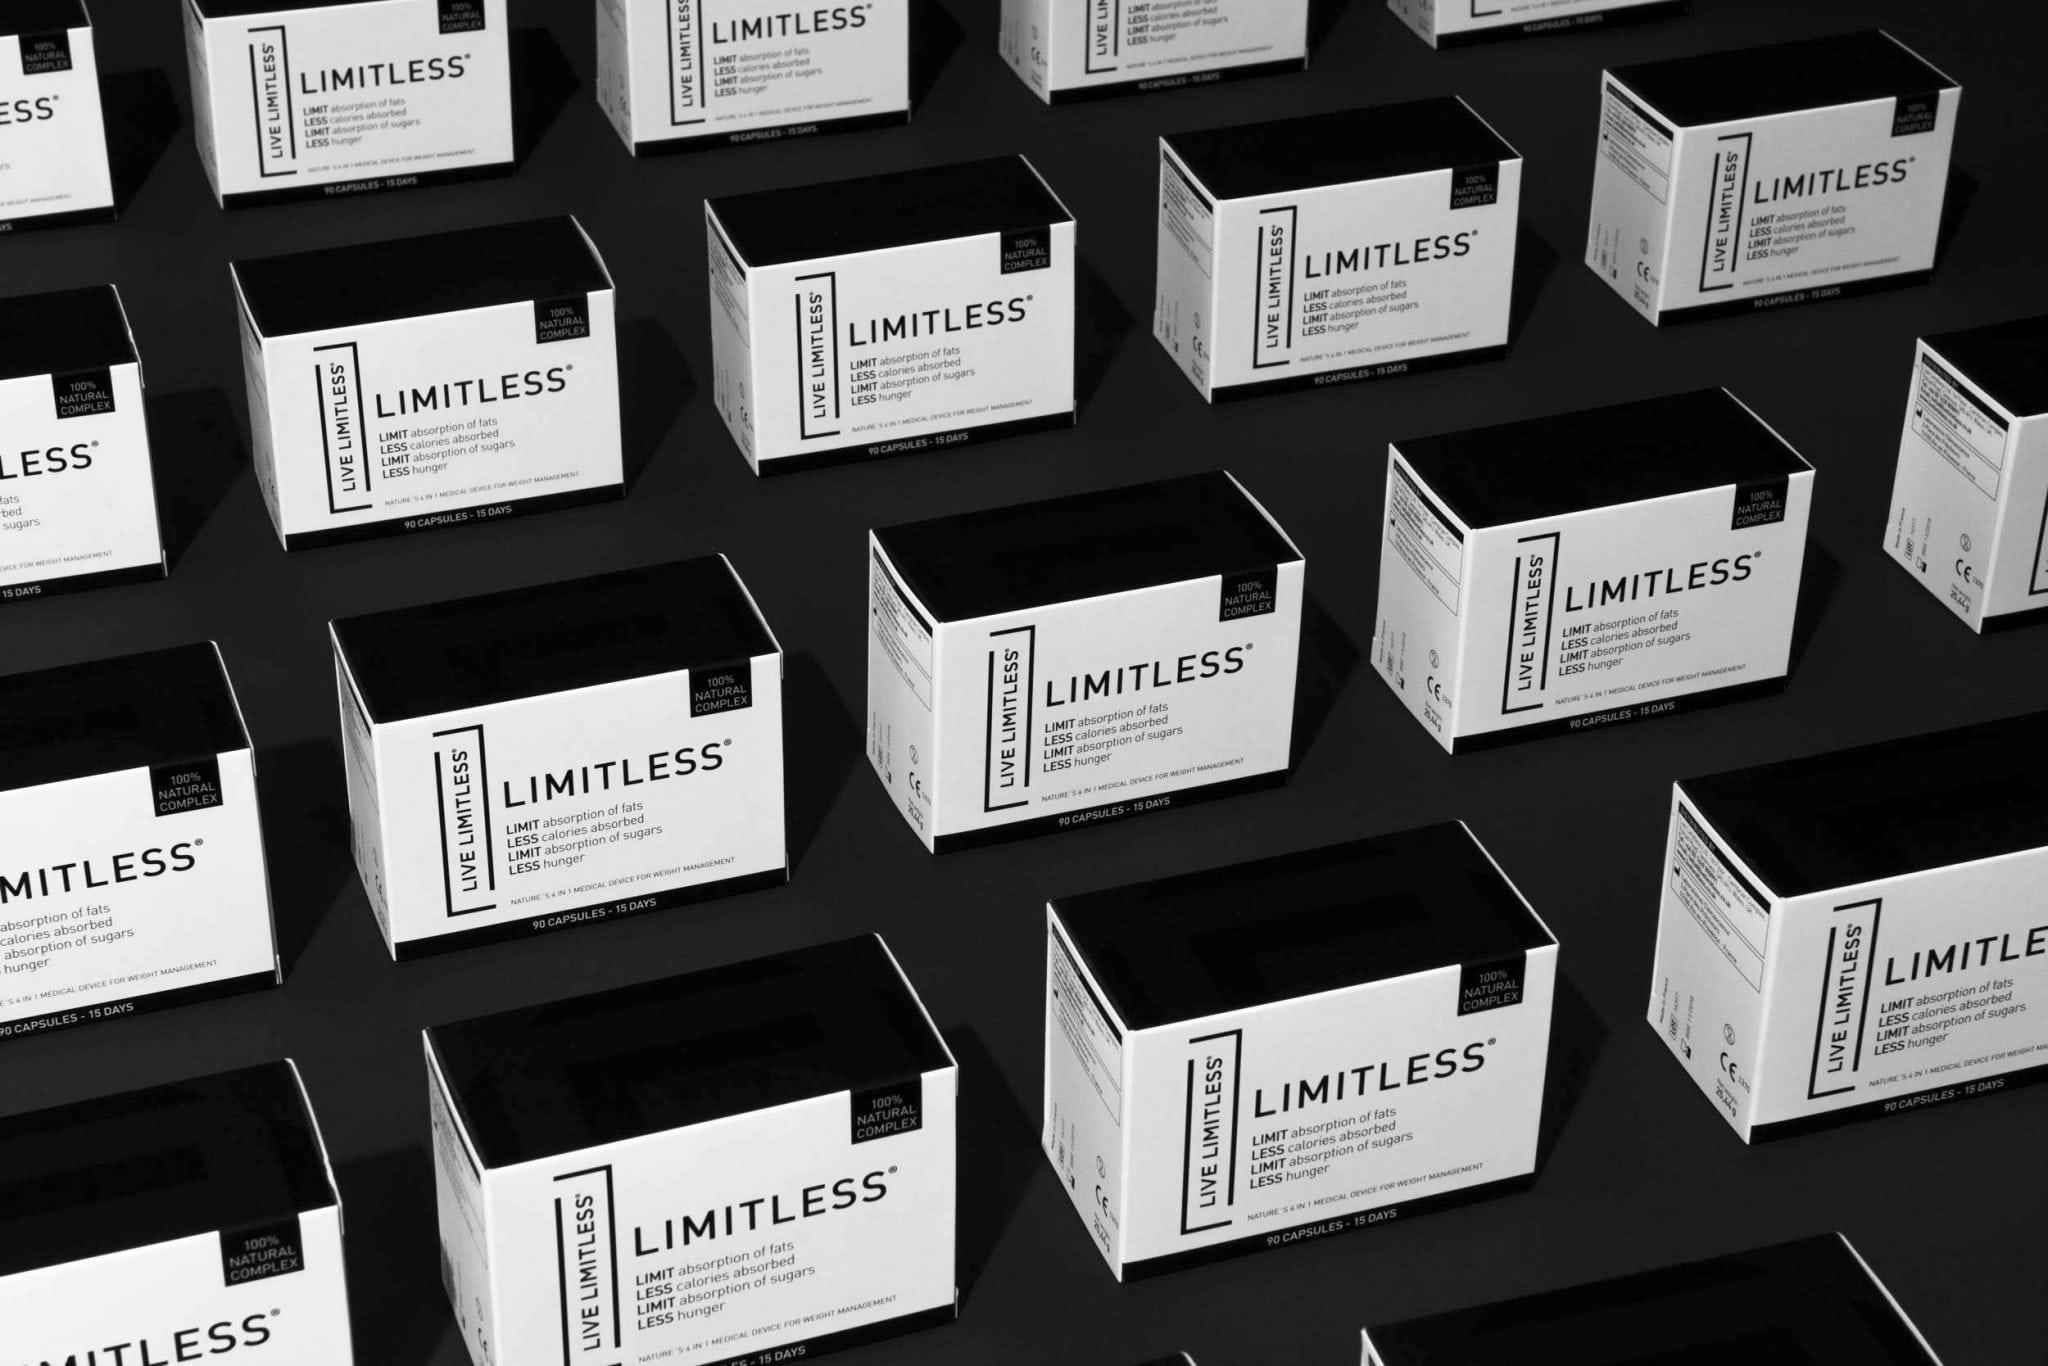 saint loupe, digital agency birmingham, creative studio uk, content production, web agency, marketing agency birmingham, packaging design